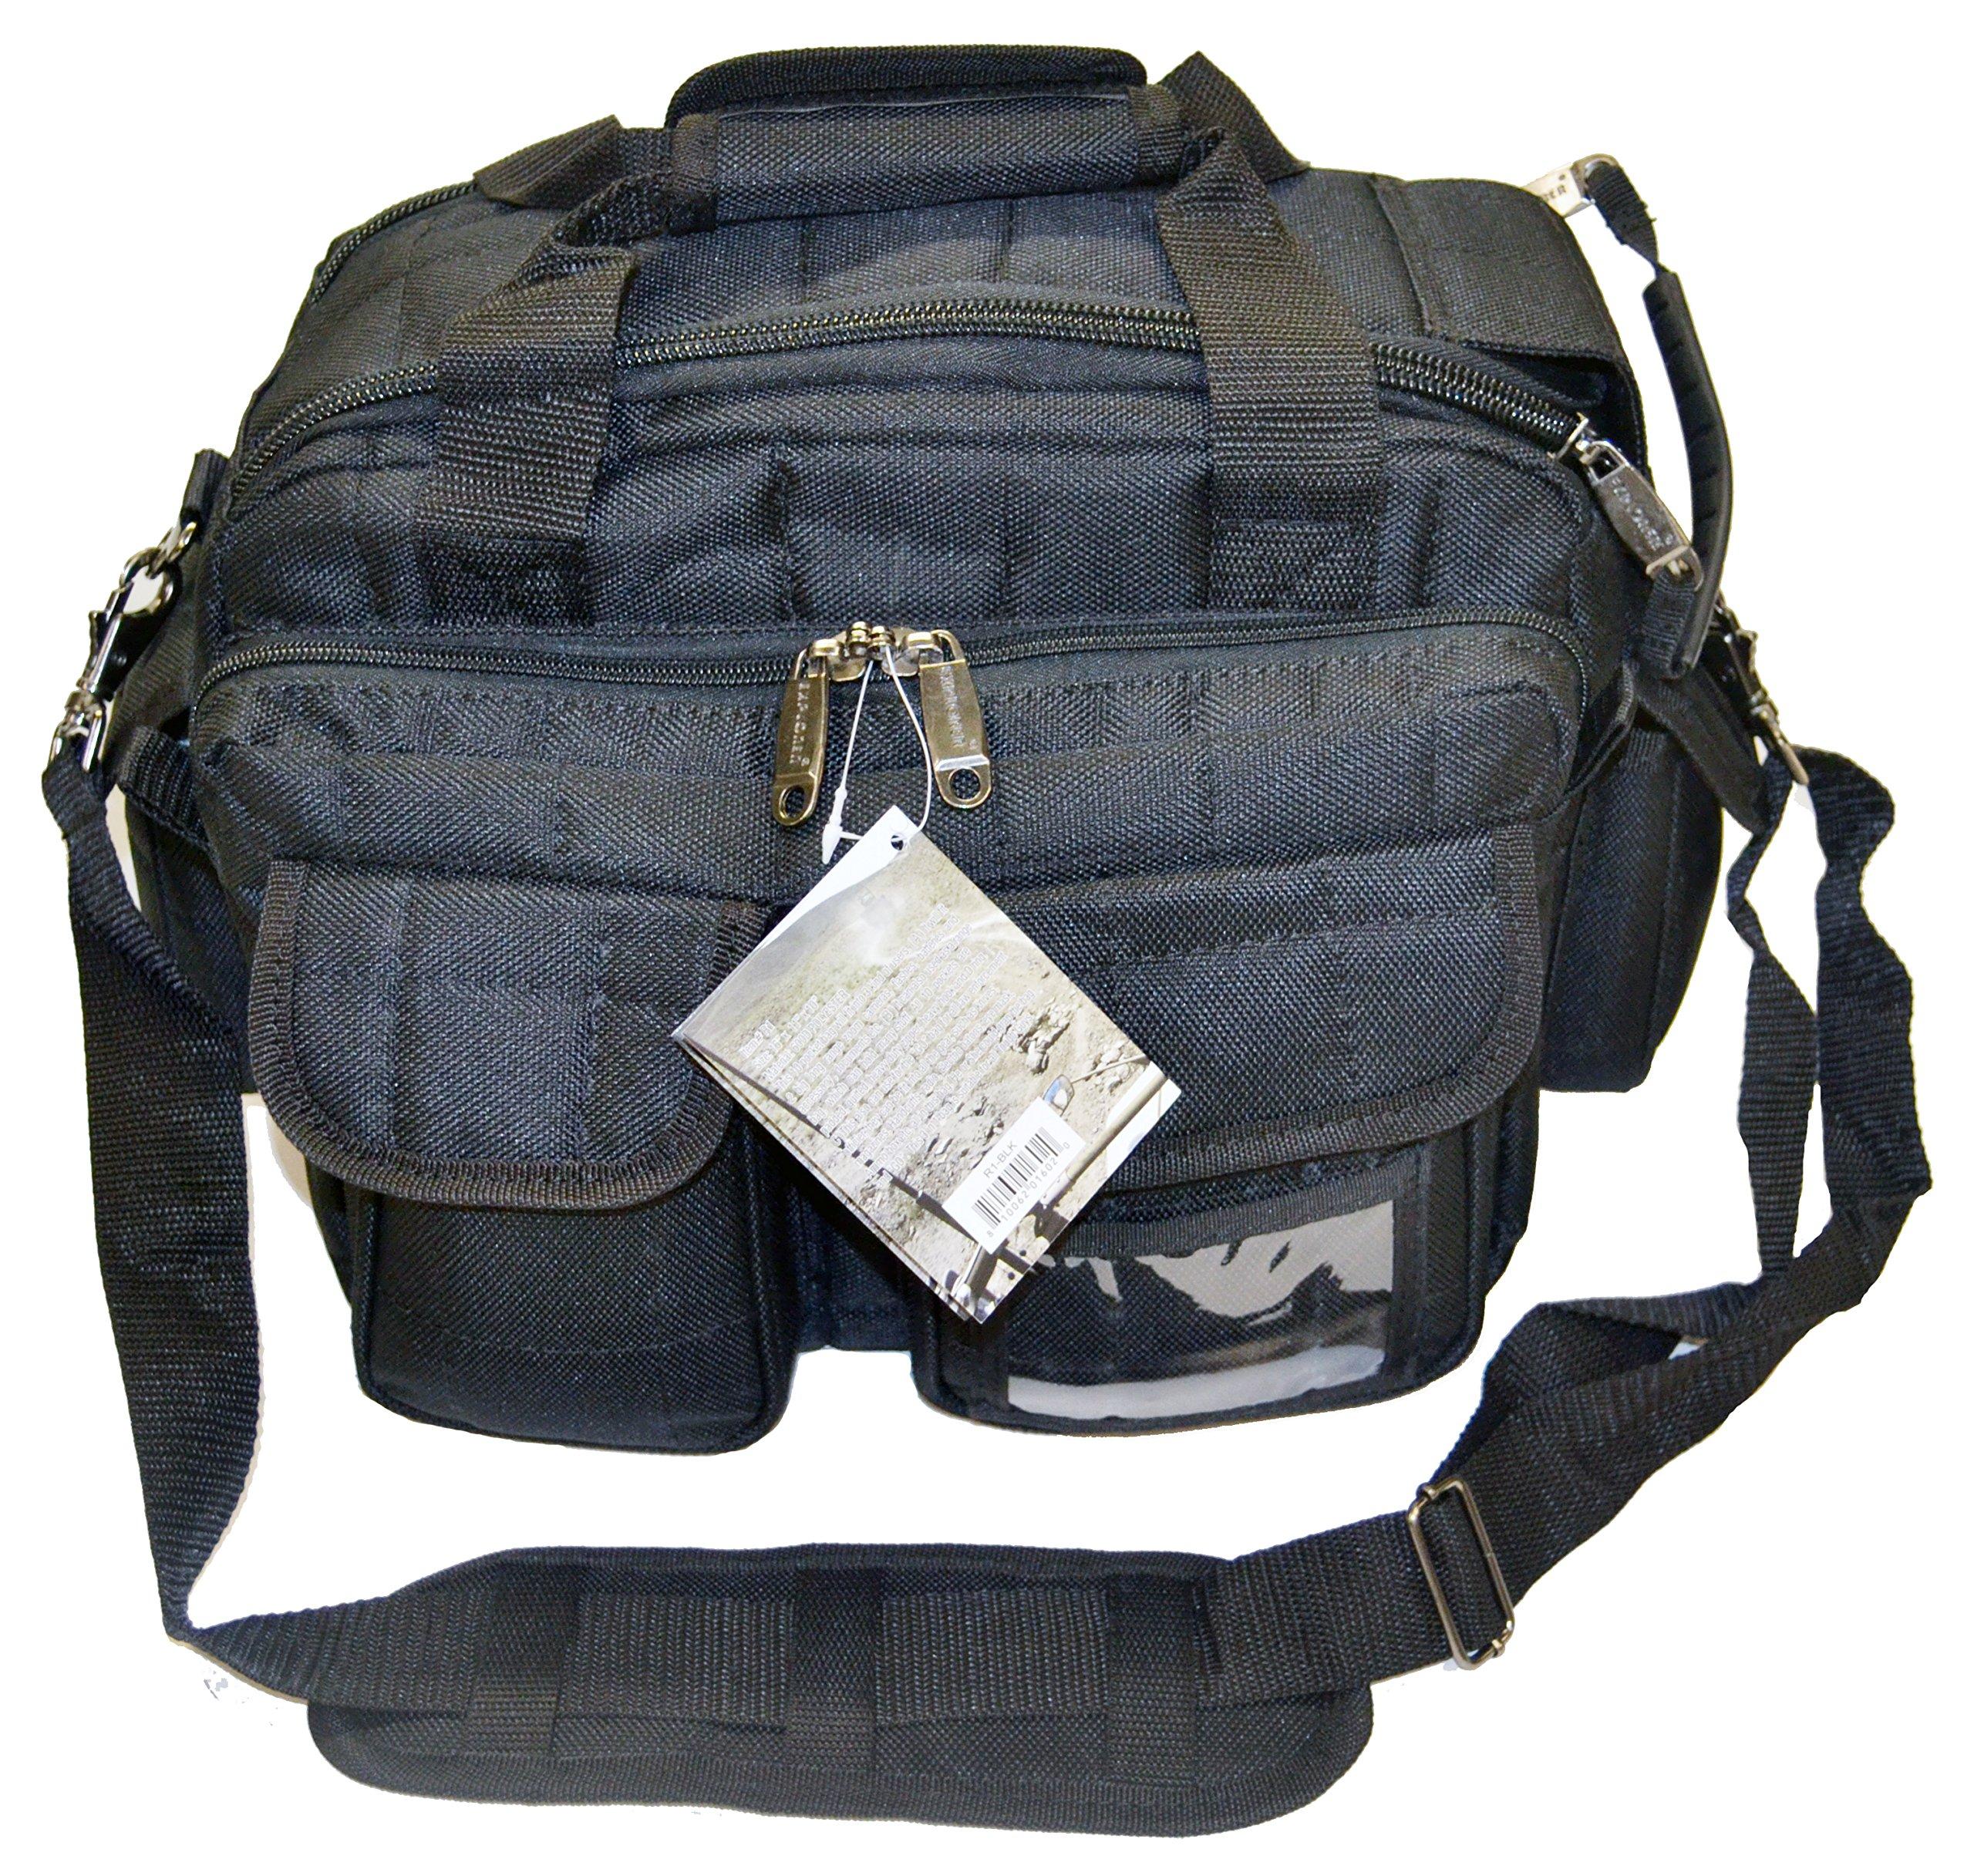 Explorer 8 Pistol Tactical Range Go Bag Assault Gear Hiking EDC Camera Bag MOLLE Modular Deployment Compact Utility Military Surplus Gear by Explorer